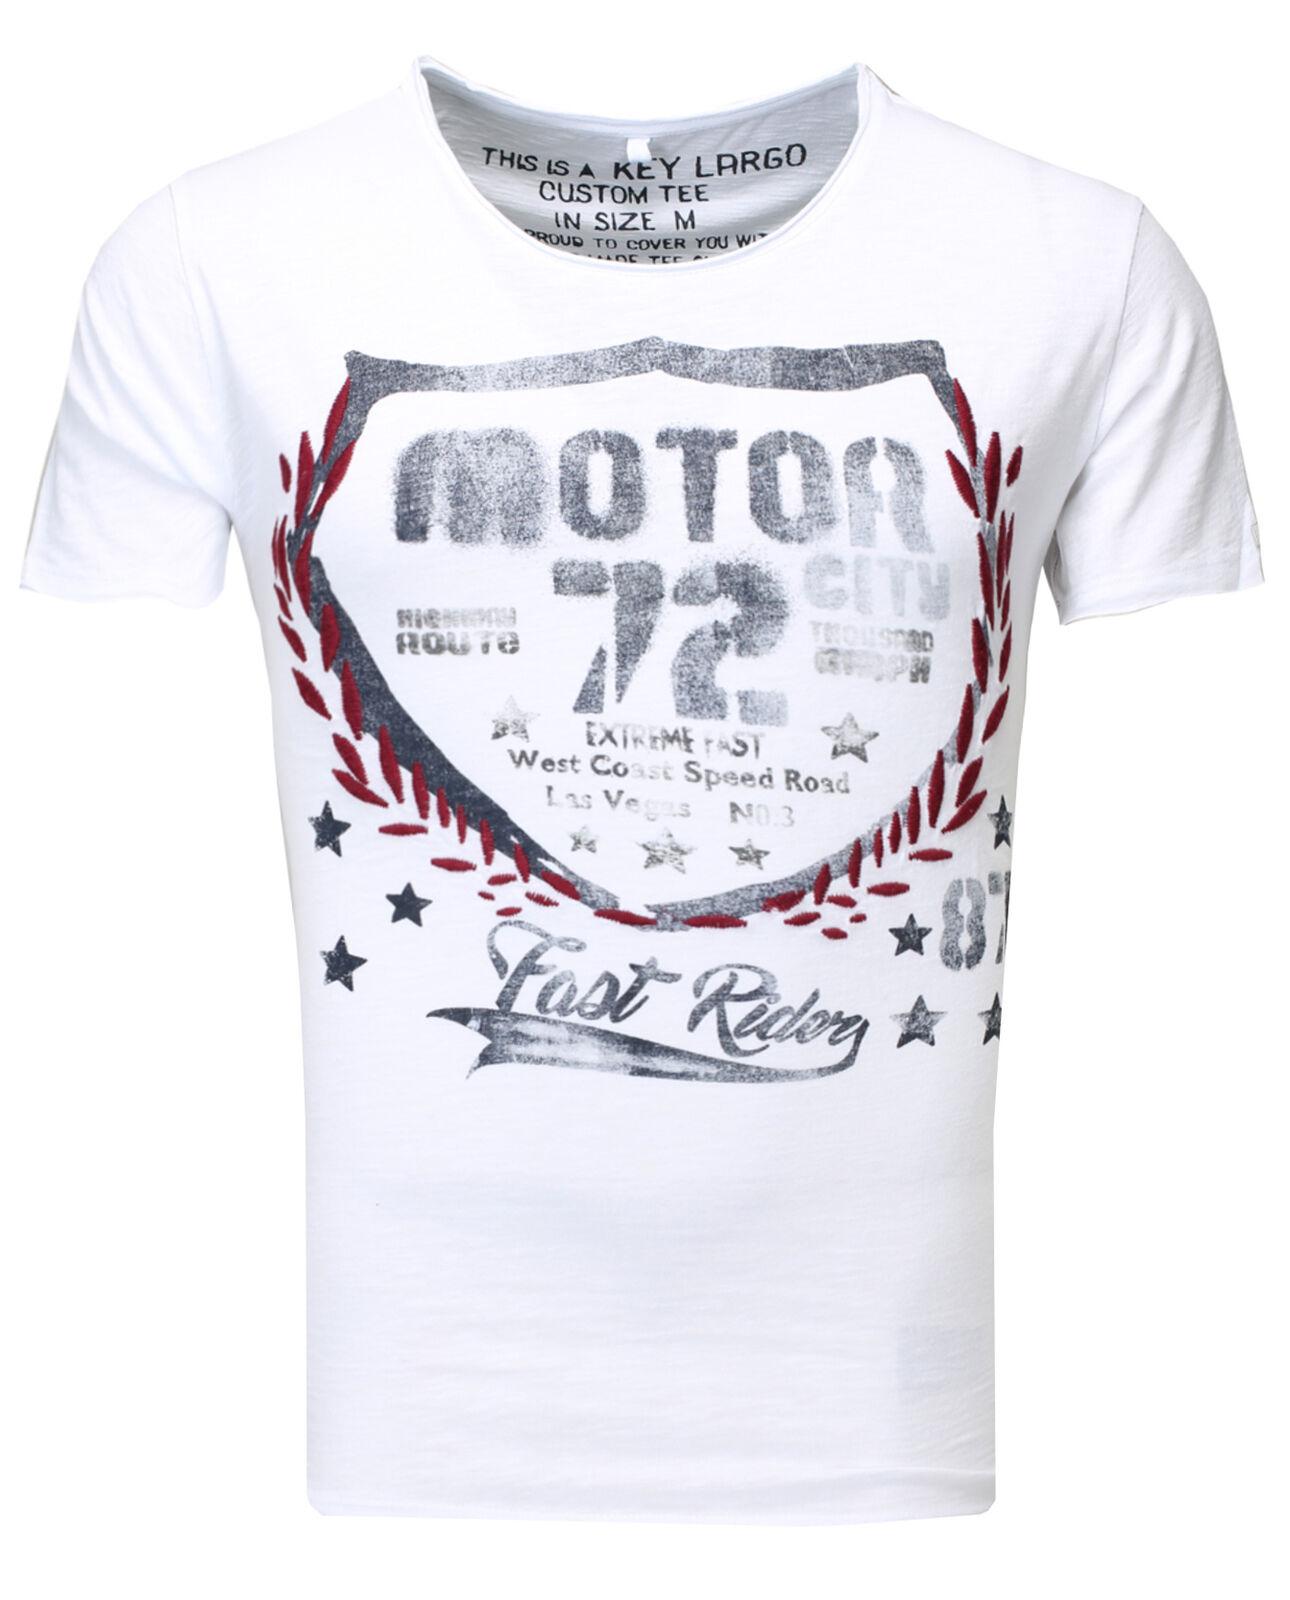 Key Largo Men's T-Shirt Short Sleeve Vintage Fast Riders mt00144 White